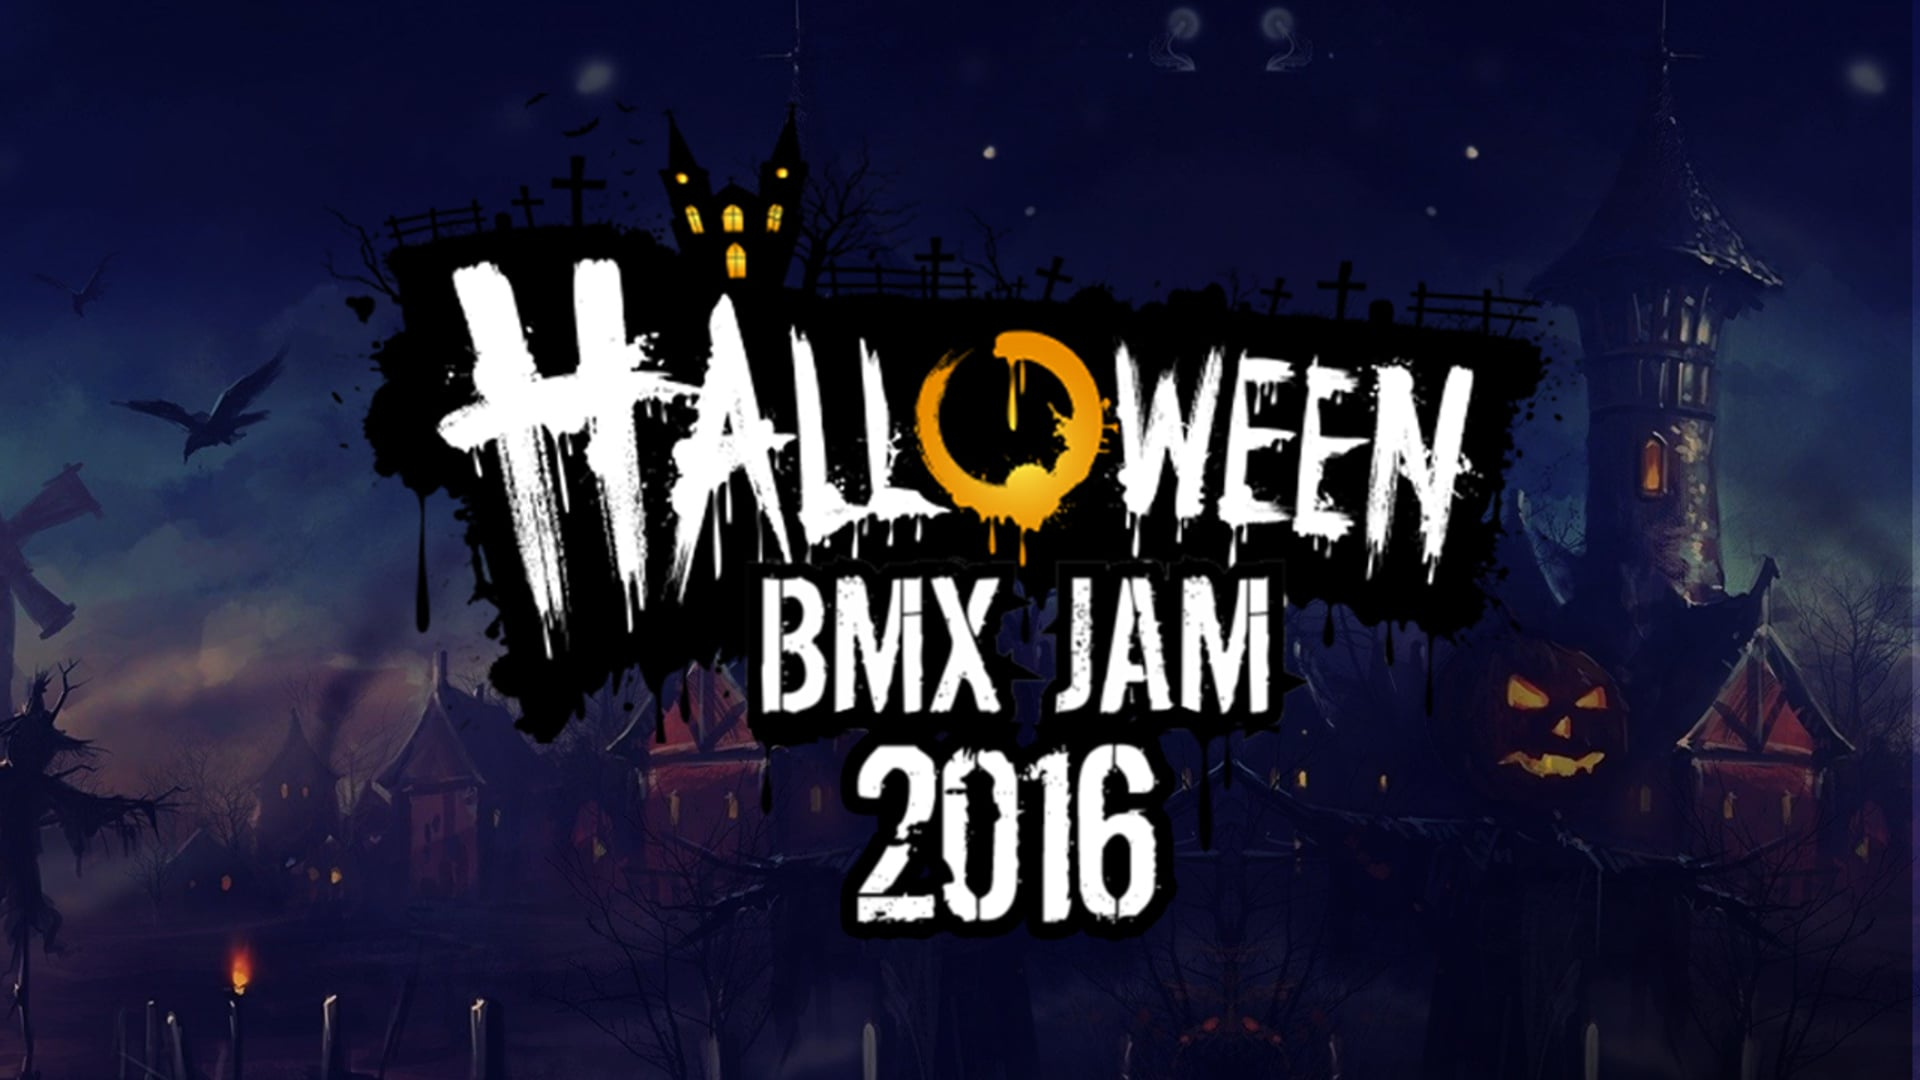 HALLOWEEN BMX JAM 2016